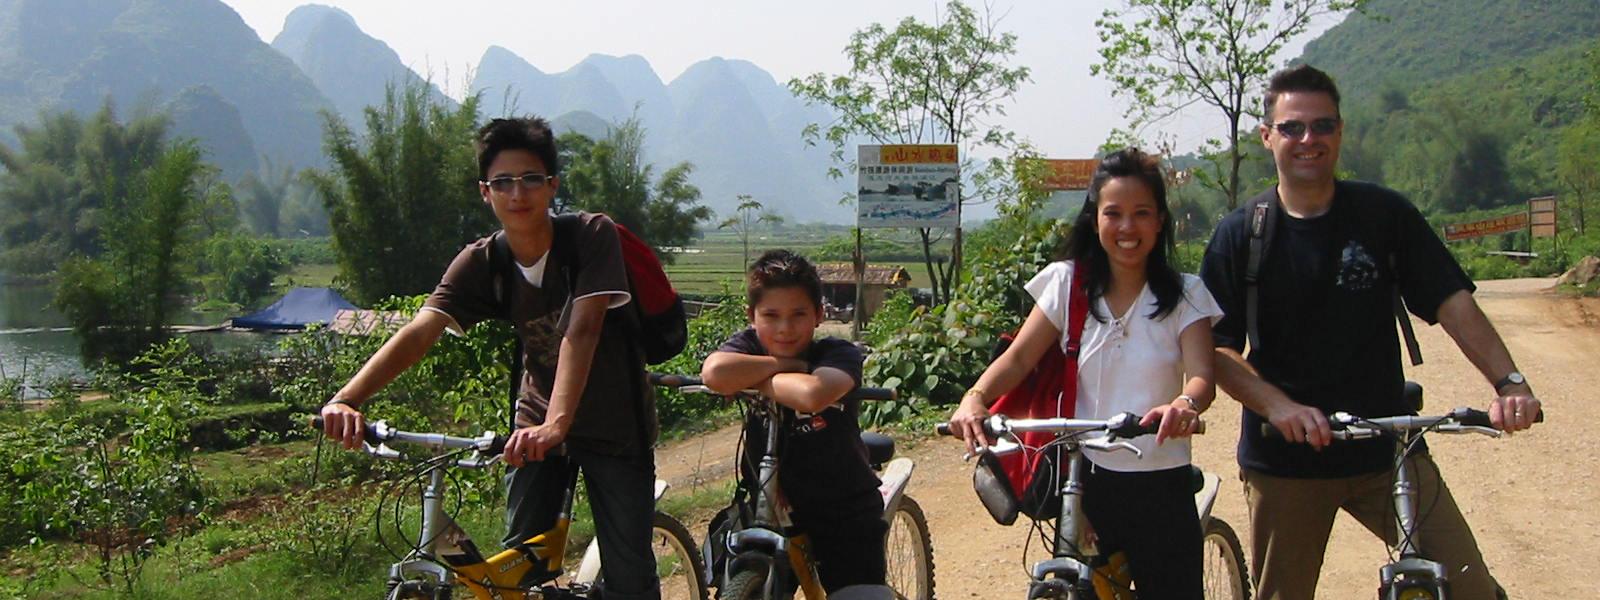 Cycling through beautiful scenery of China